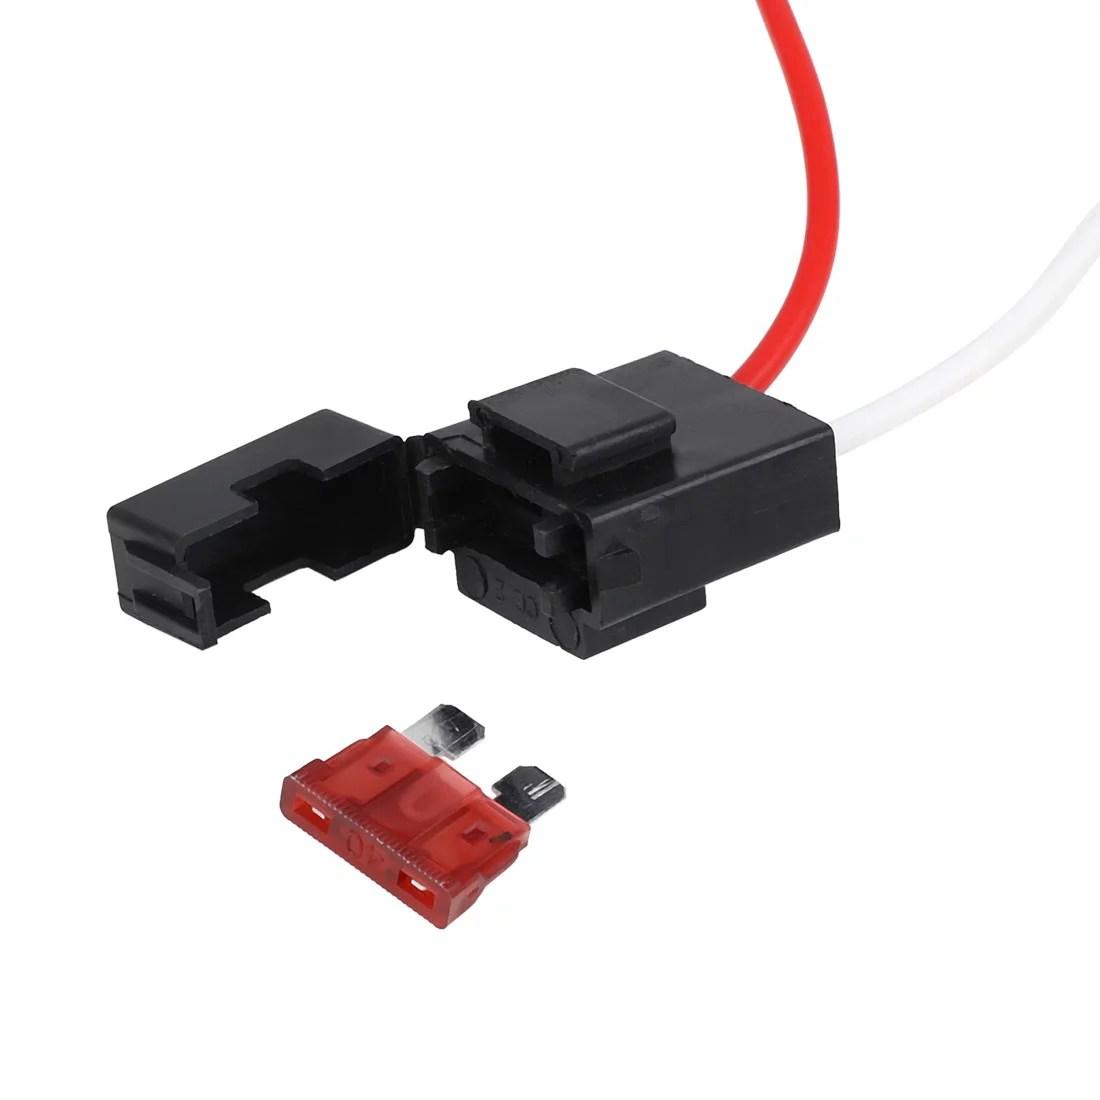 dc 12v car truck grille mount blast tone speaker wiring harness easy wiring harness kit car [ 1100 x 1100 Pixel ]